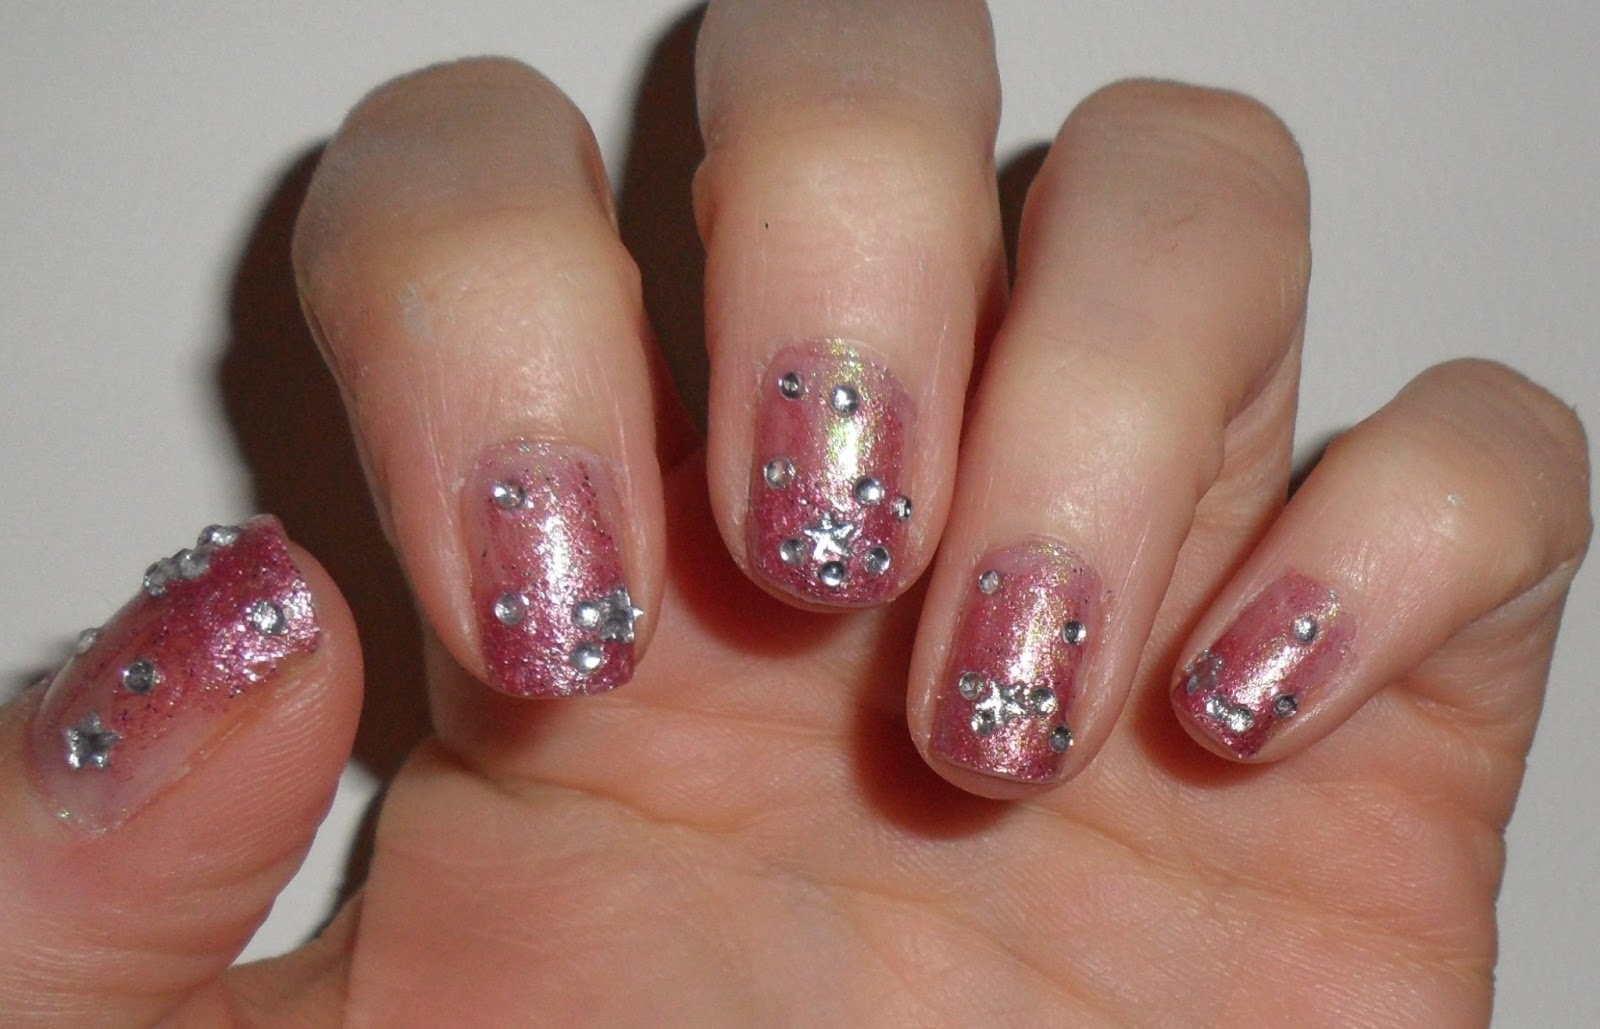 Nail Art Ideas nail art gems designs : Nail Art Rhinestones Designs - Best Nails Art Ideas